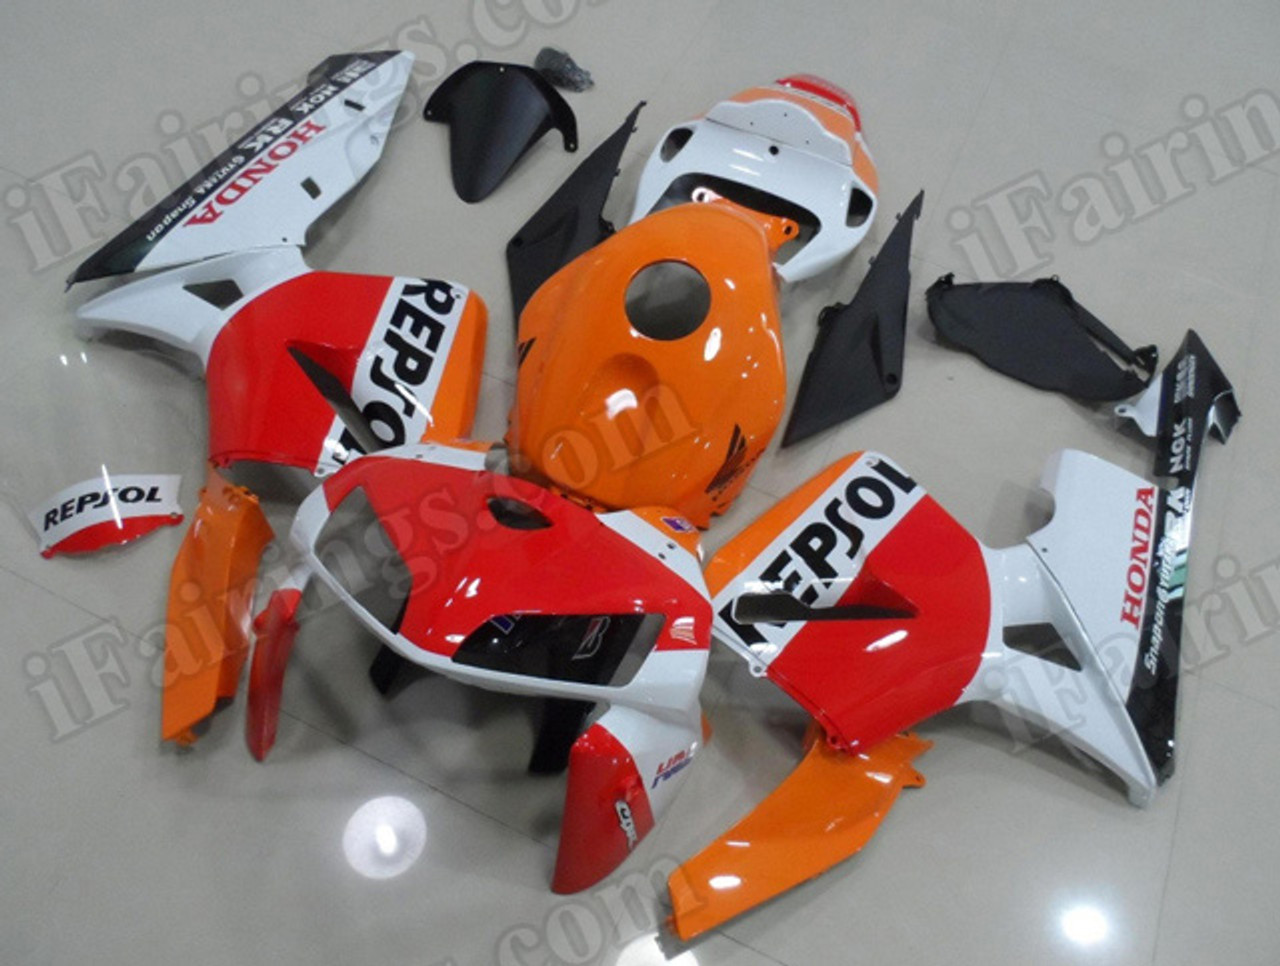 Oem Replacement Fairing Sets For Honda Cbr600rr 2005 2006 Repsol